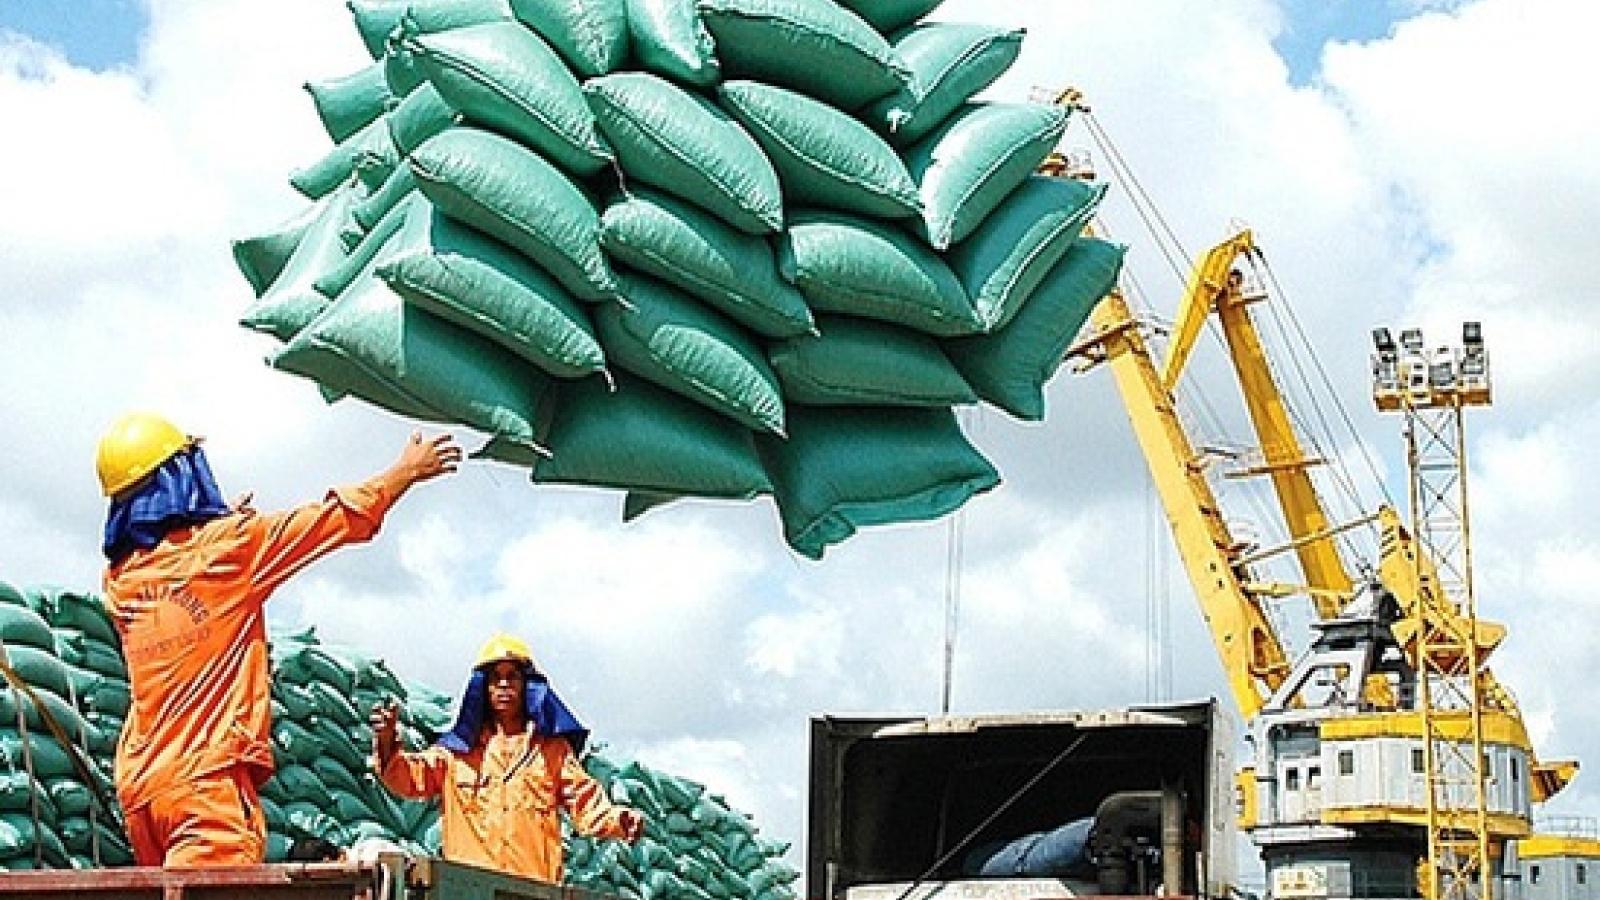 Measures taken to prevent origin fraud of Vietnamese rice